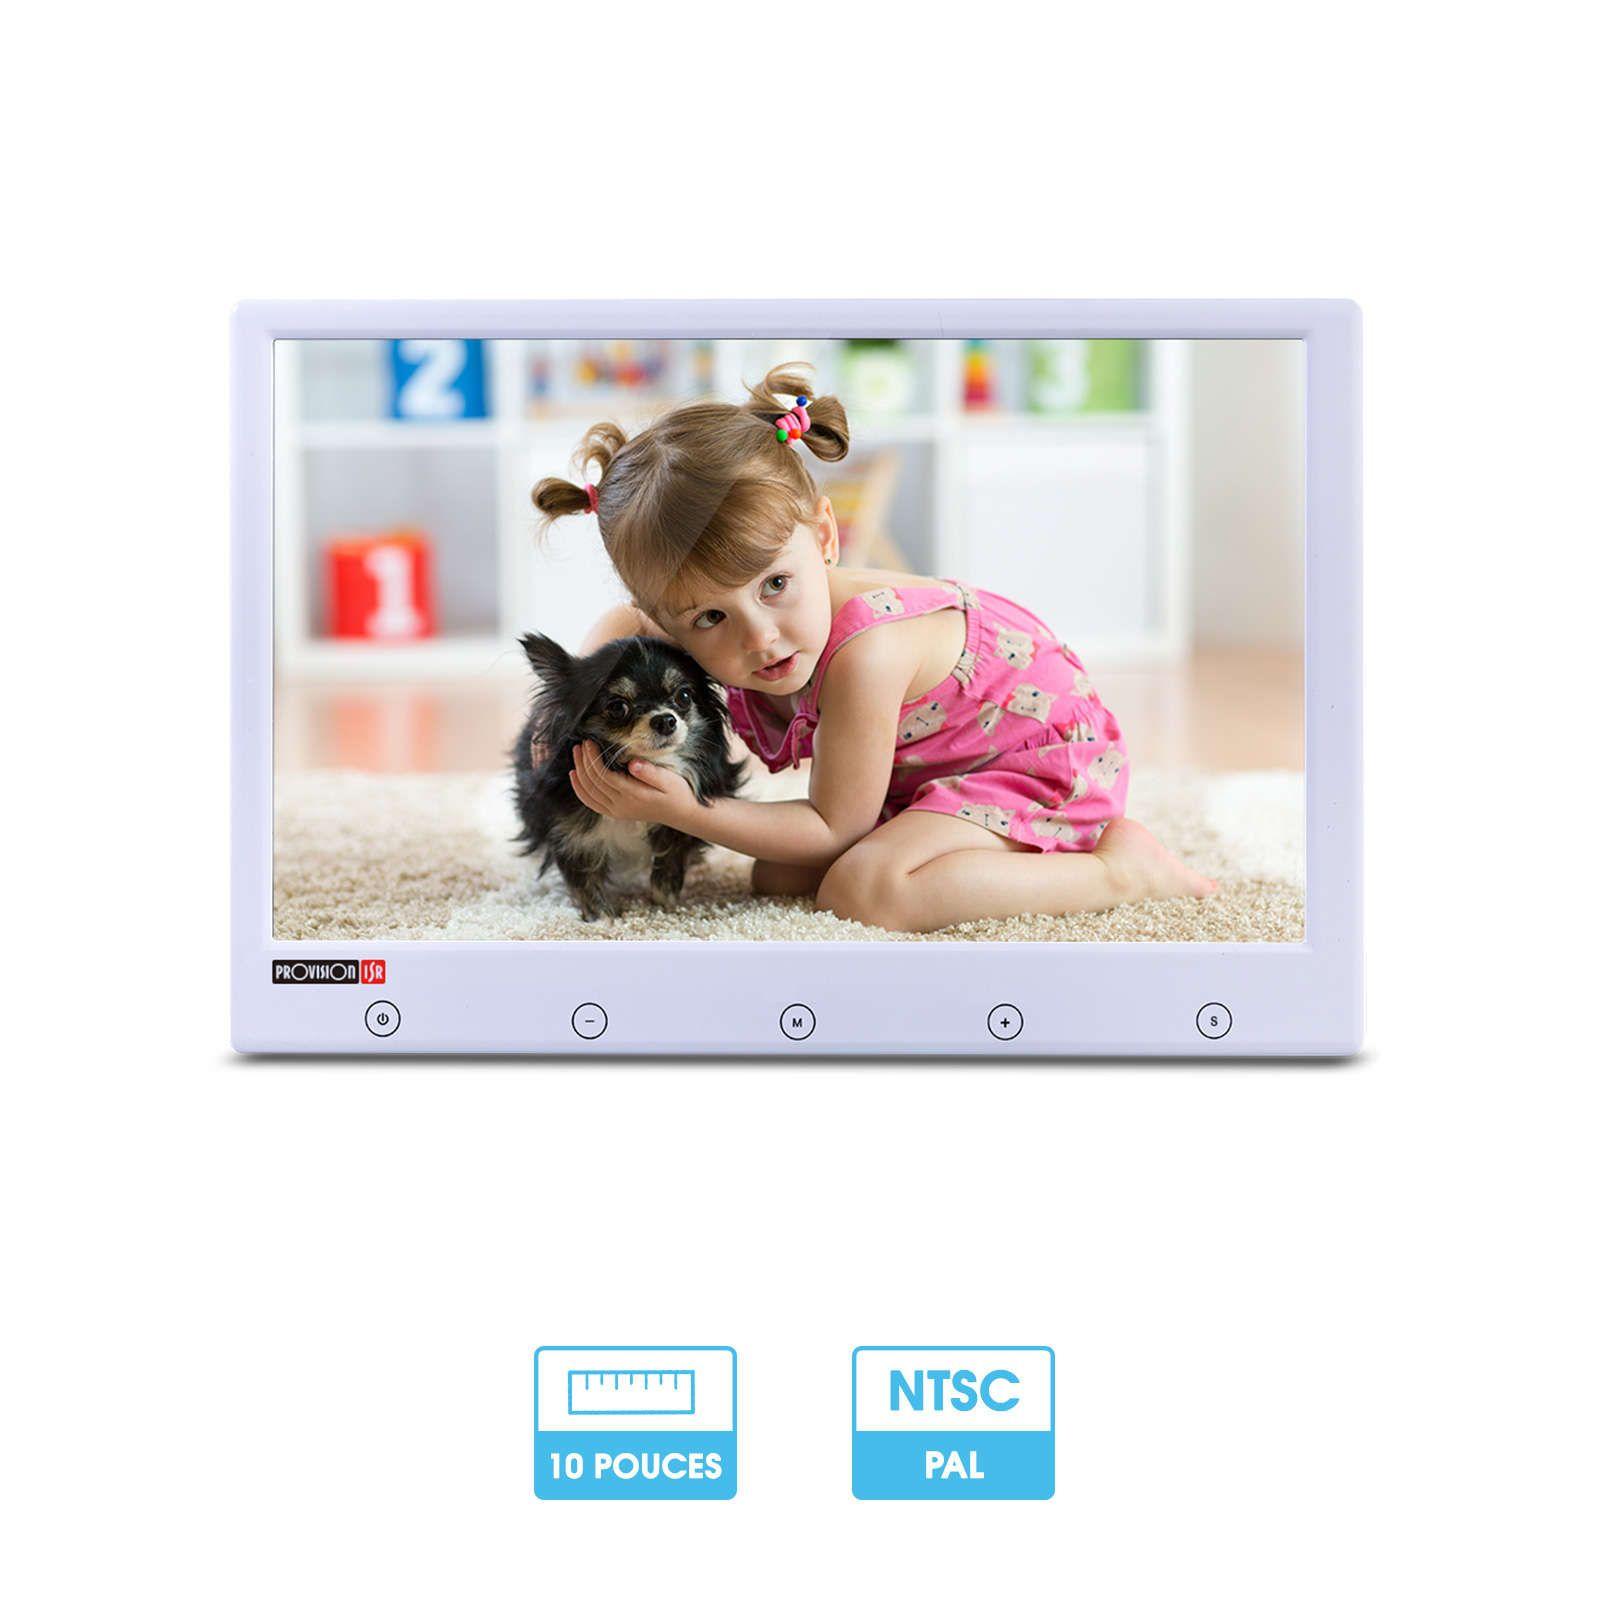 """§Ecran de vidéosurveillance 10"""" PAL / NTSC | 2 entrées vidéo analogiques | HDMI & VGA | Provision§"""